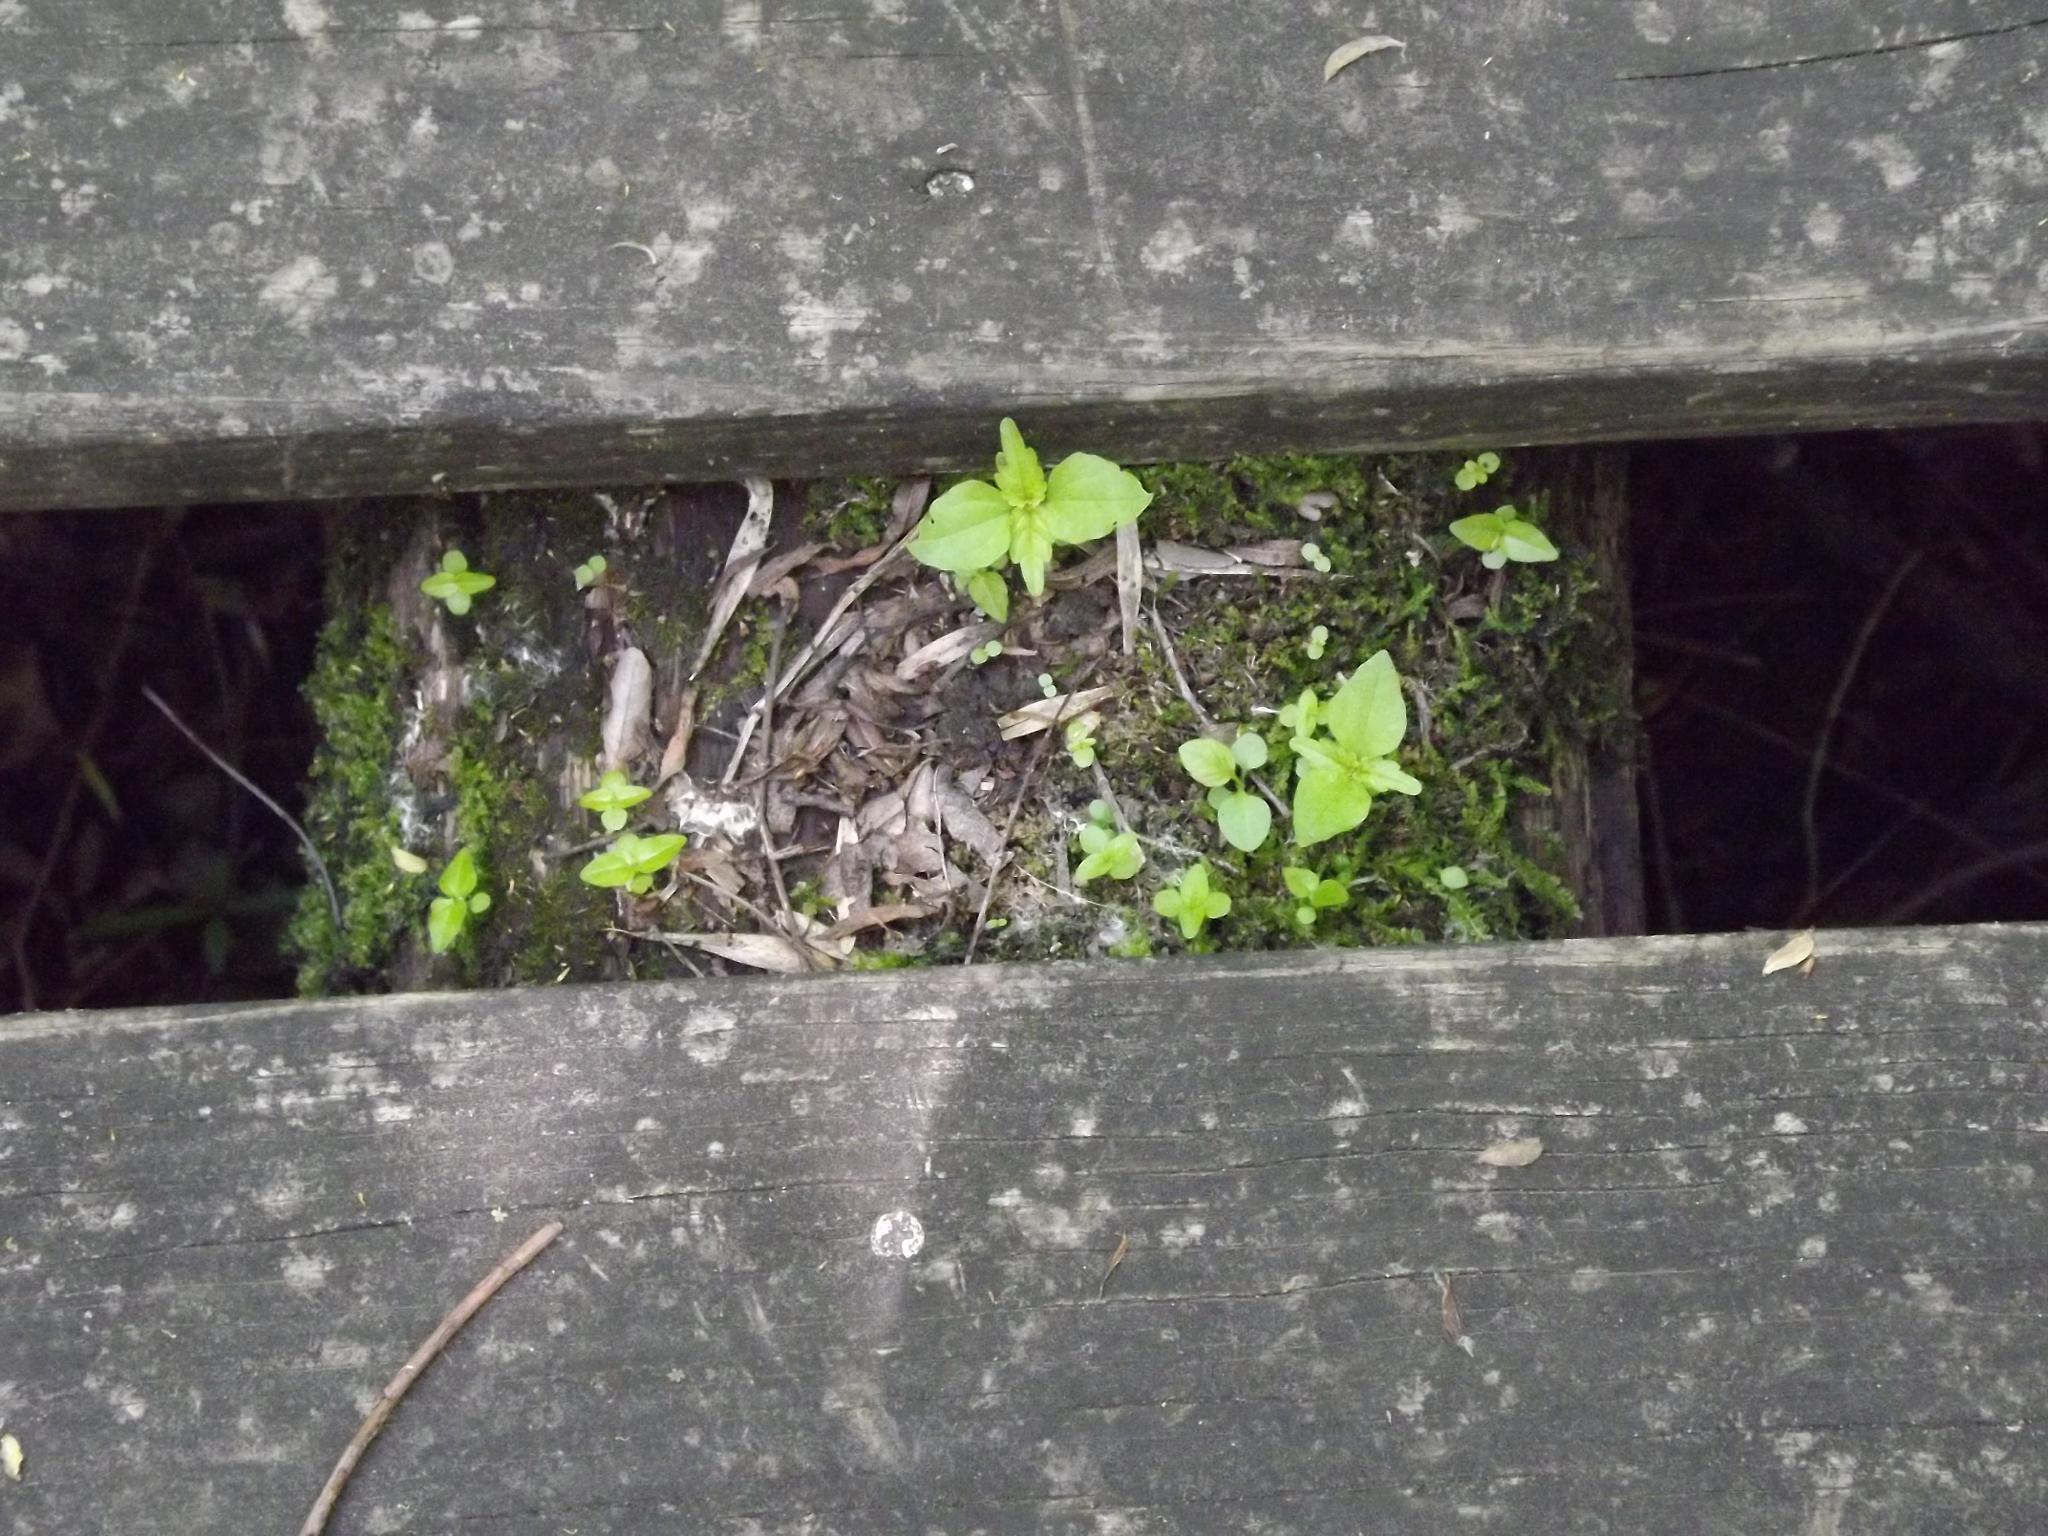 Peeking Up Through the Cracks by erica.english.522